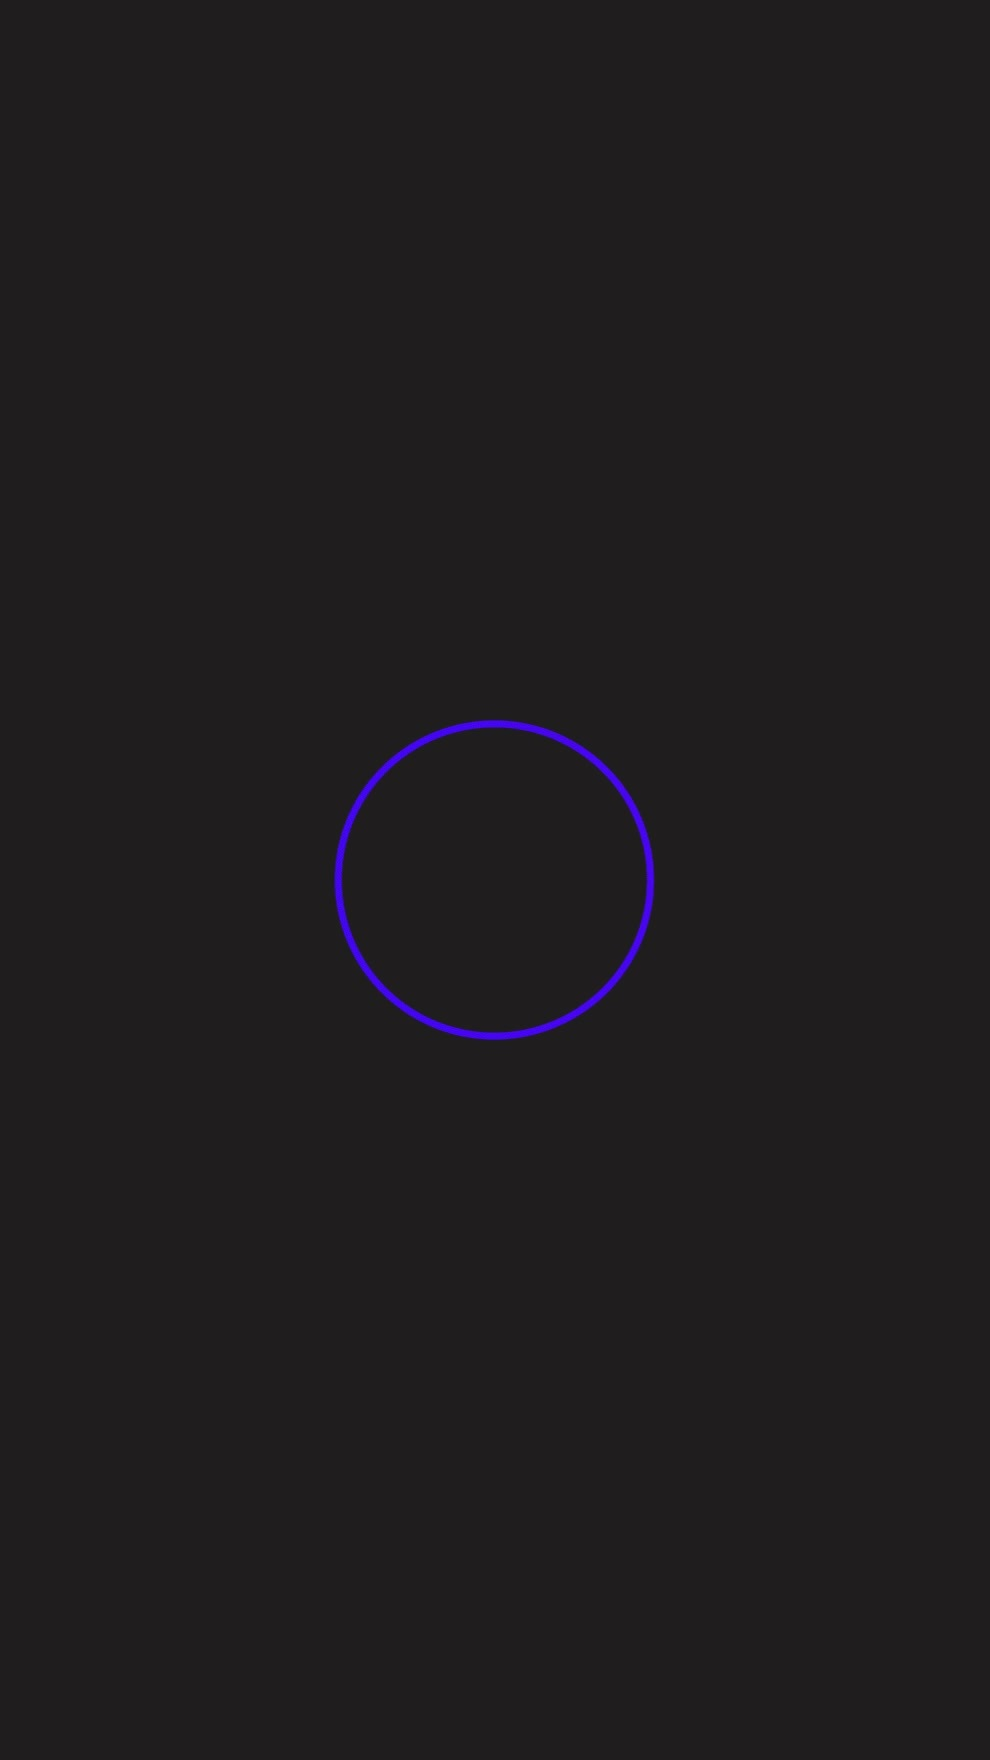 RainbowLoop GIFs